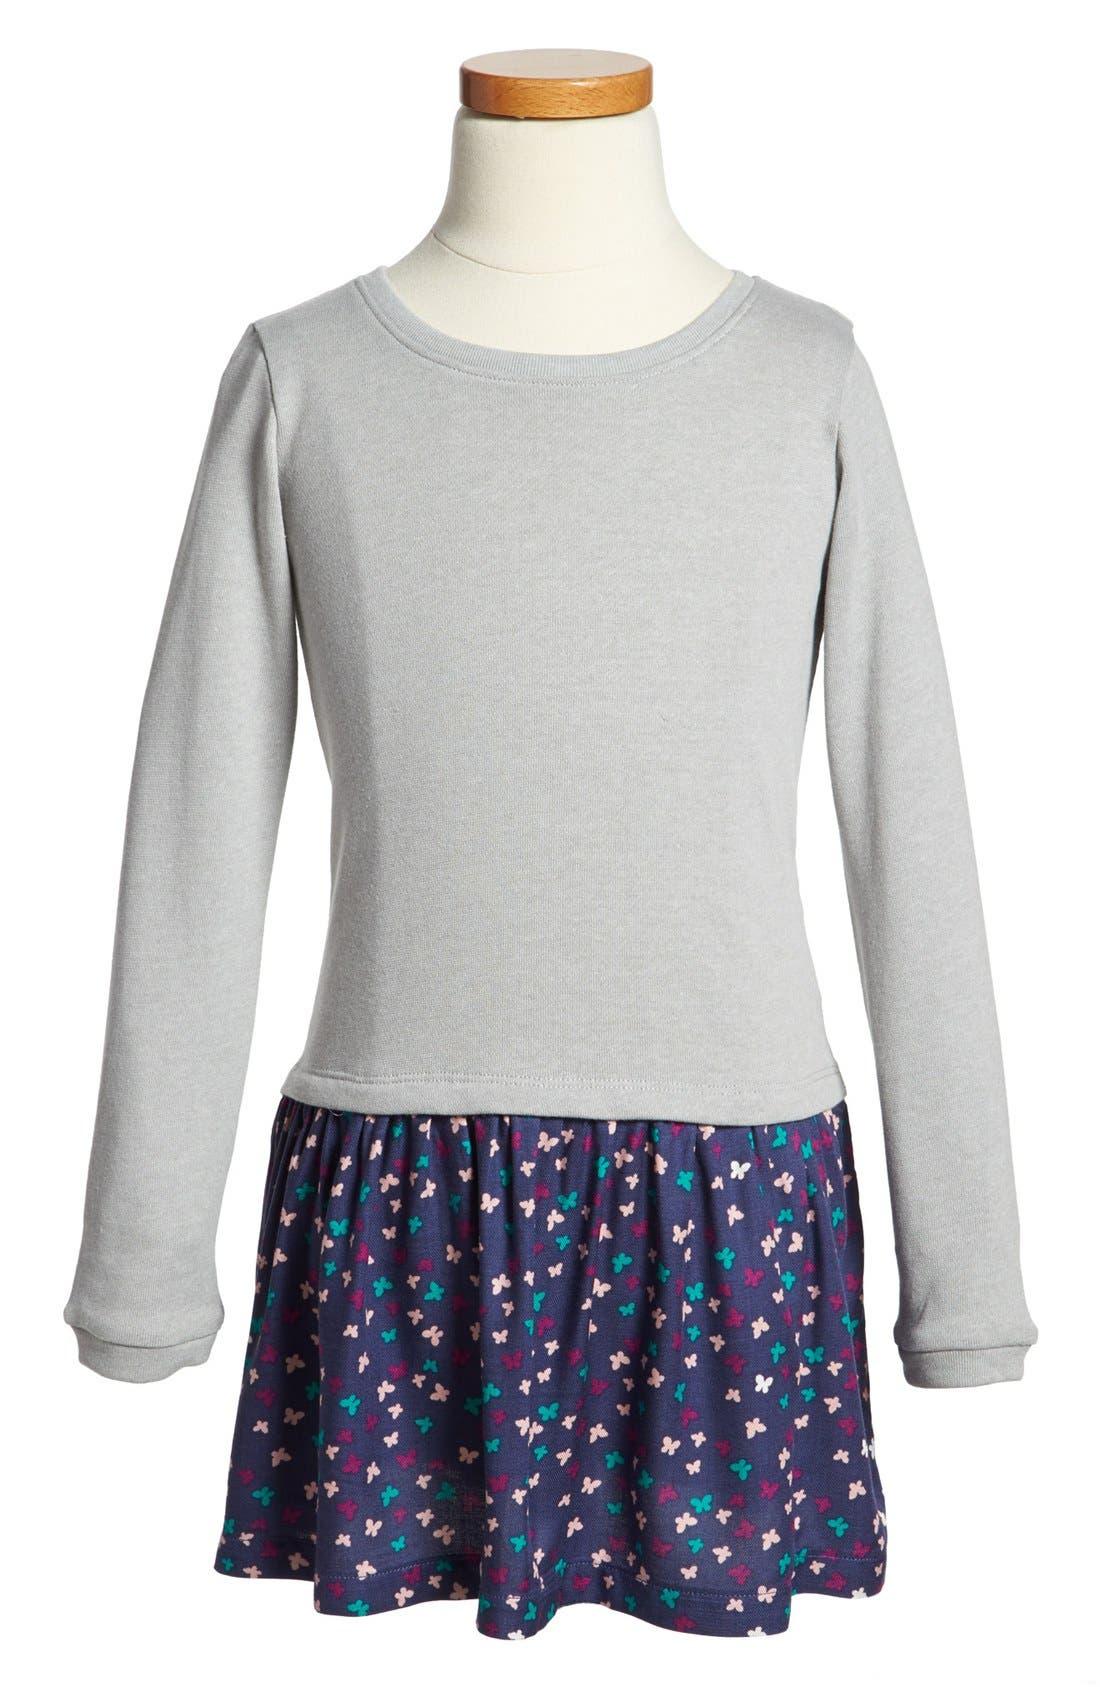 Main Image - Tucker + Tate 'Martina' Dress (Little Girls & Big Girls)